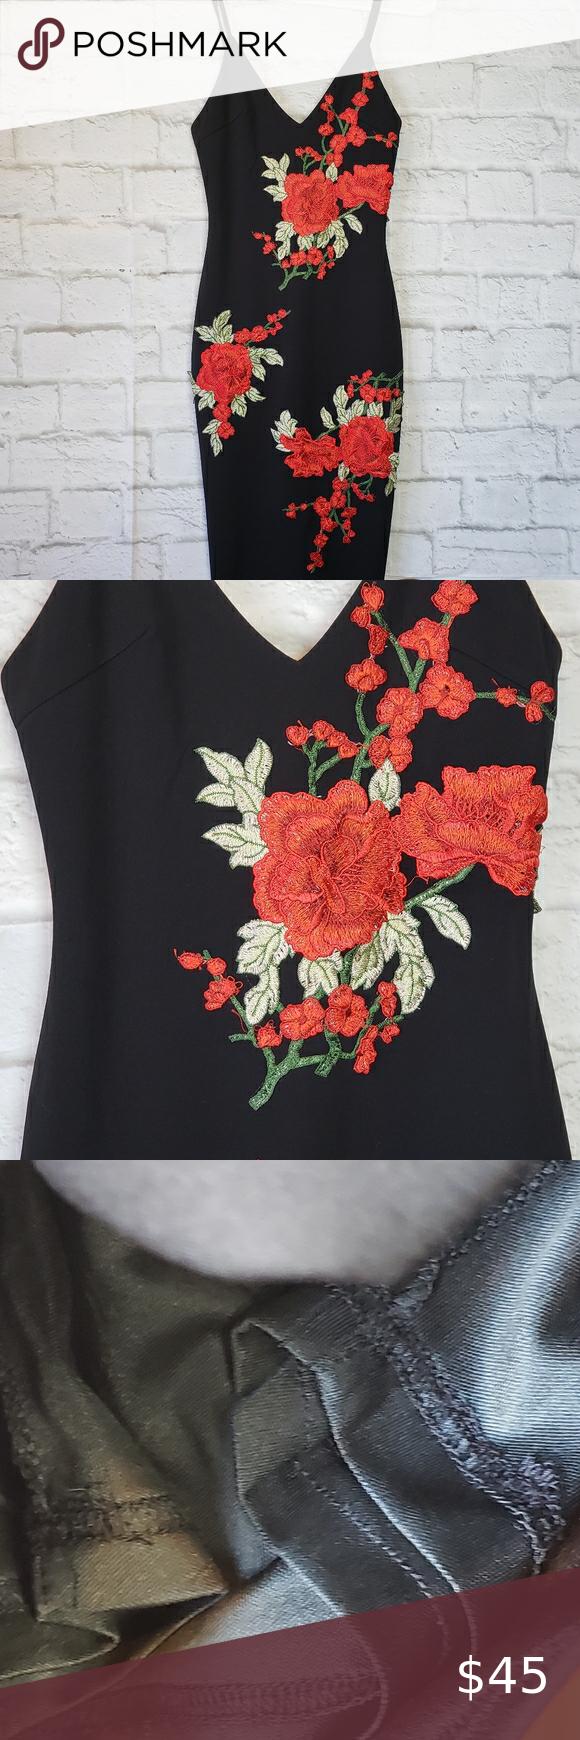 Angel Biba Black Dress Red Roses Xs Red Dress Colorful Dresses Clothes Design [ 1740 x 580 Pixel ]